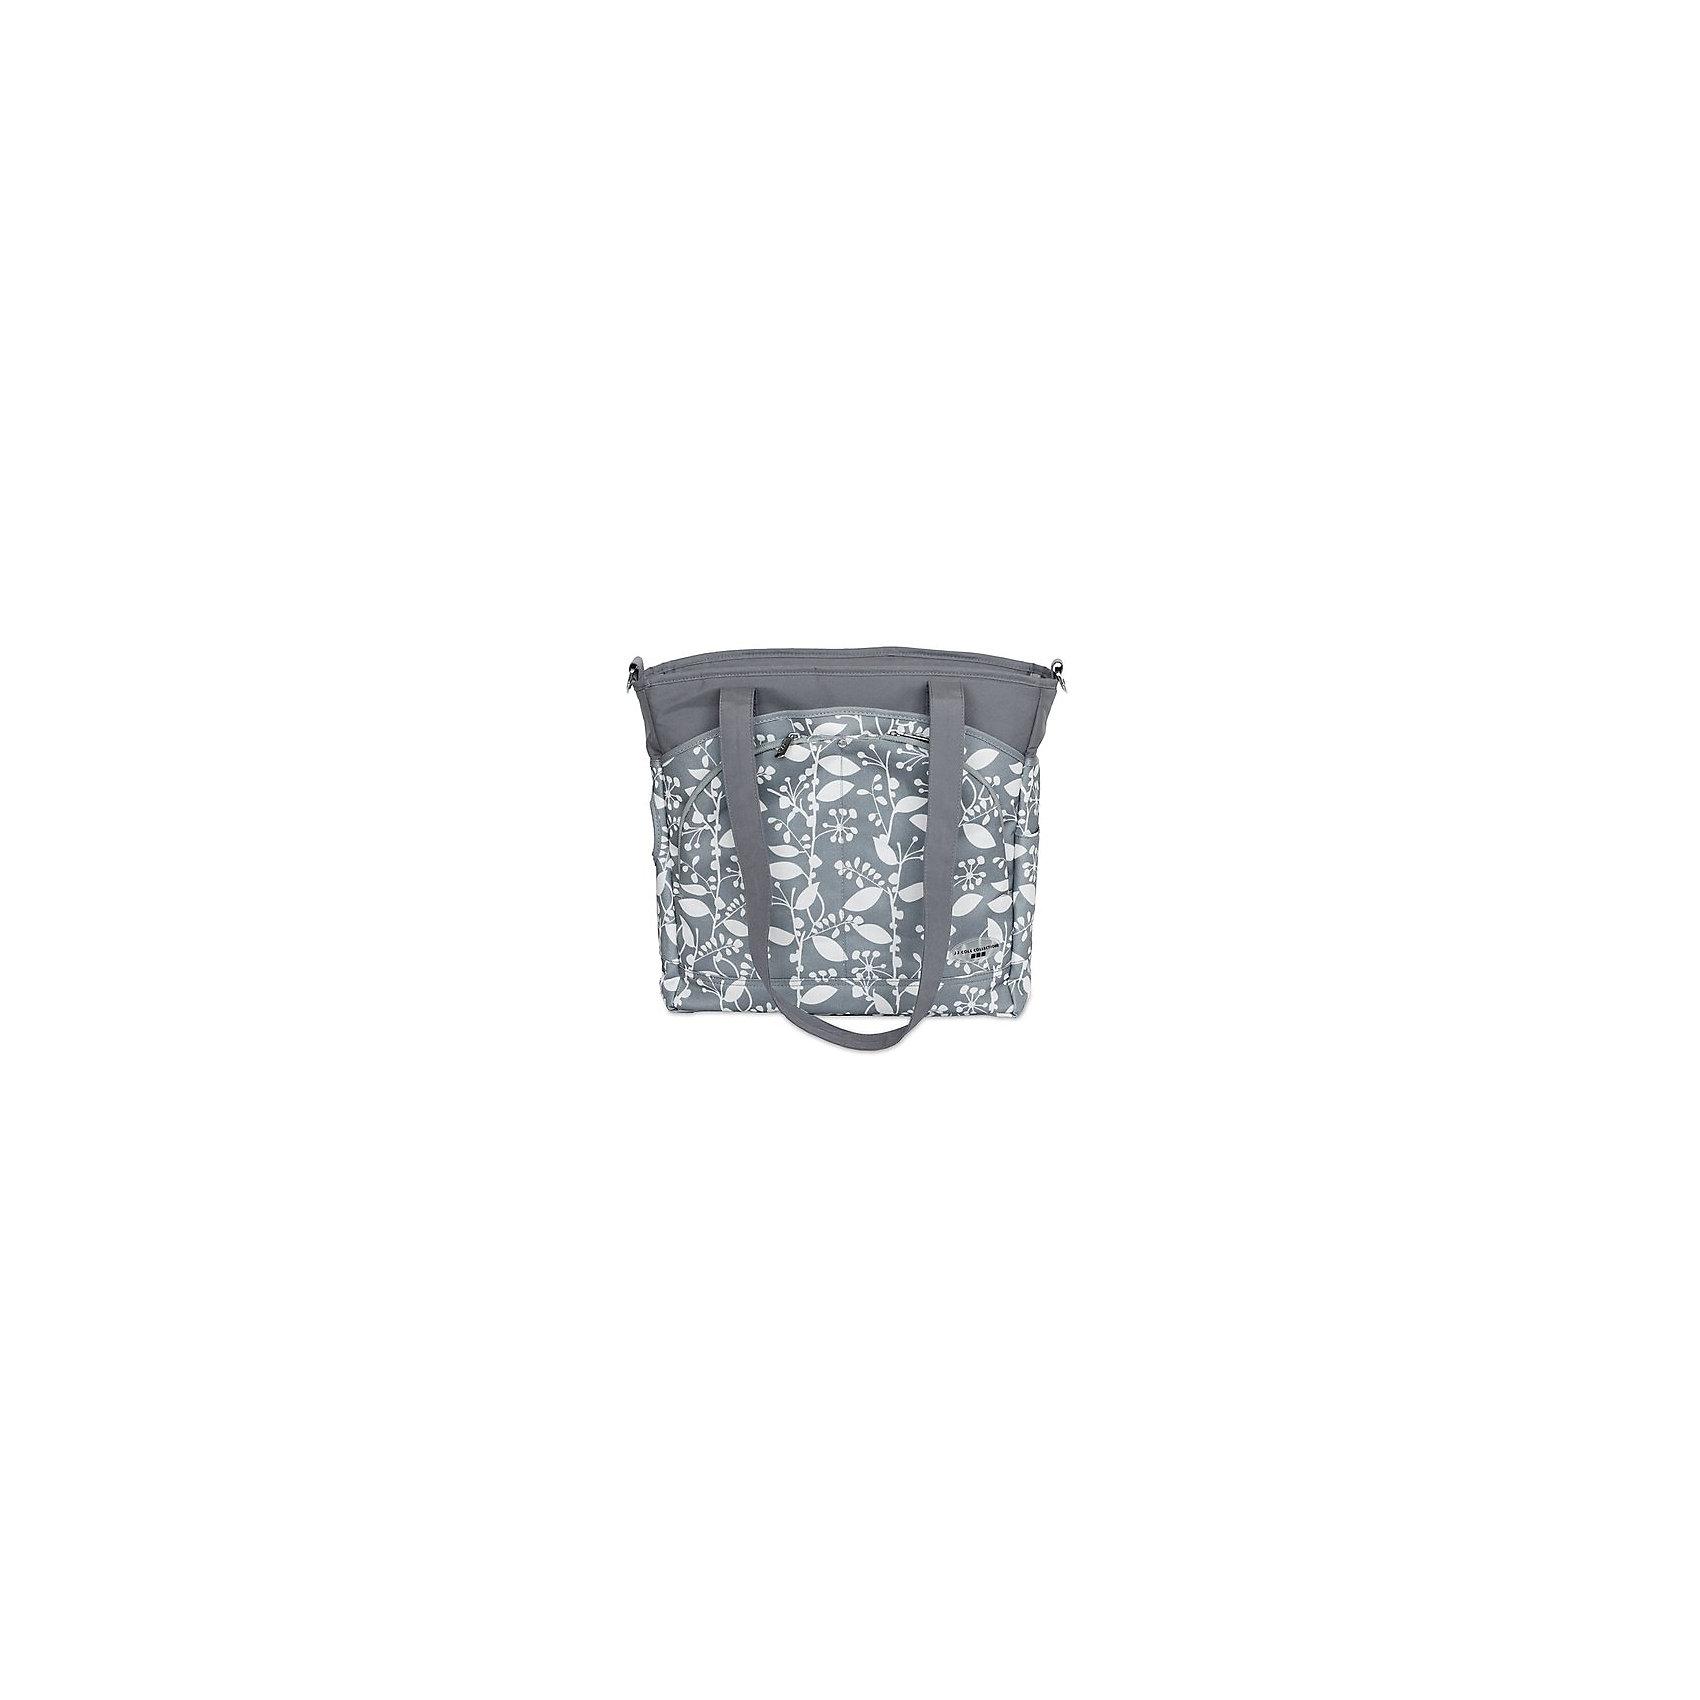 Сумка Mode,JJ Cole, серый с цветочным орнаментом (JJ COLE)